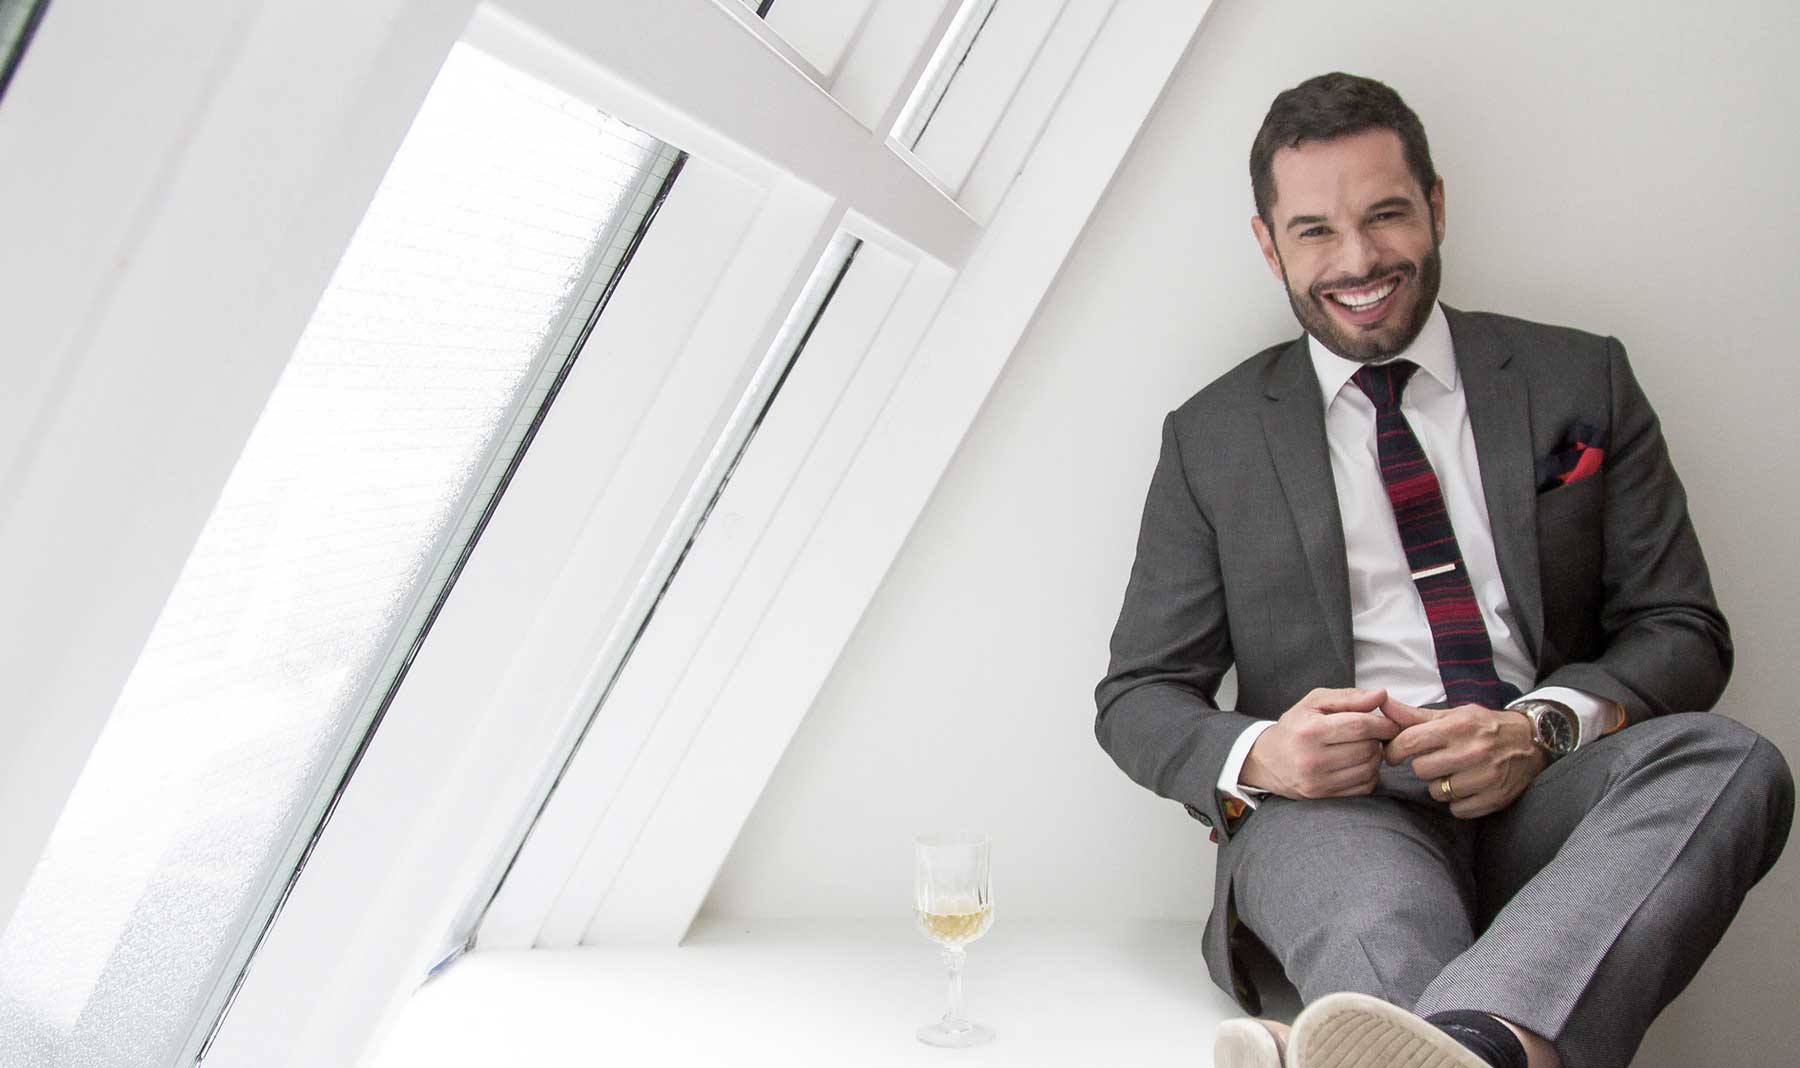 Mathieu Chantelois, Executive Director of Pride Toronto, wears our Dark Gray Birdseye Suit.